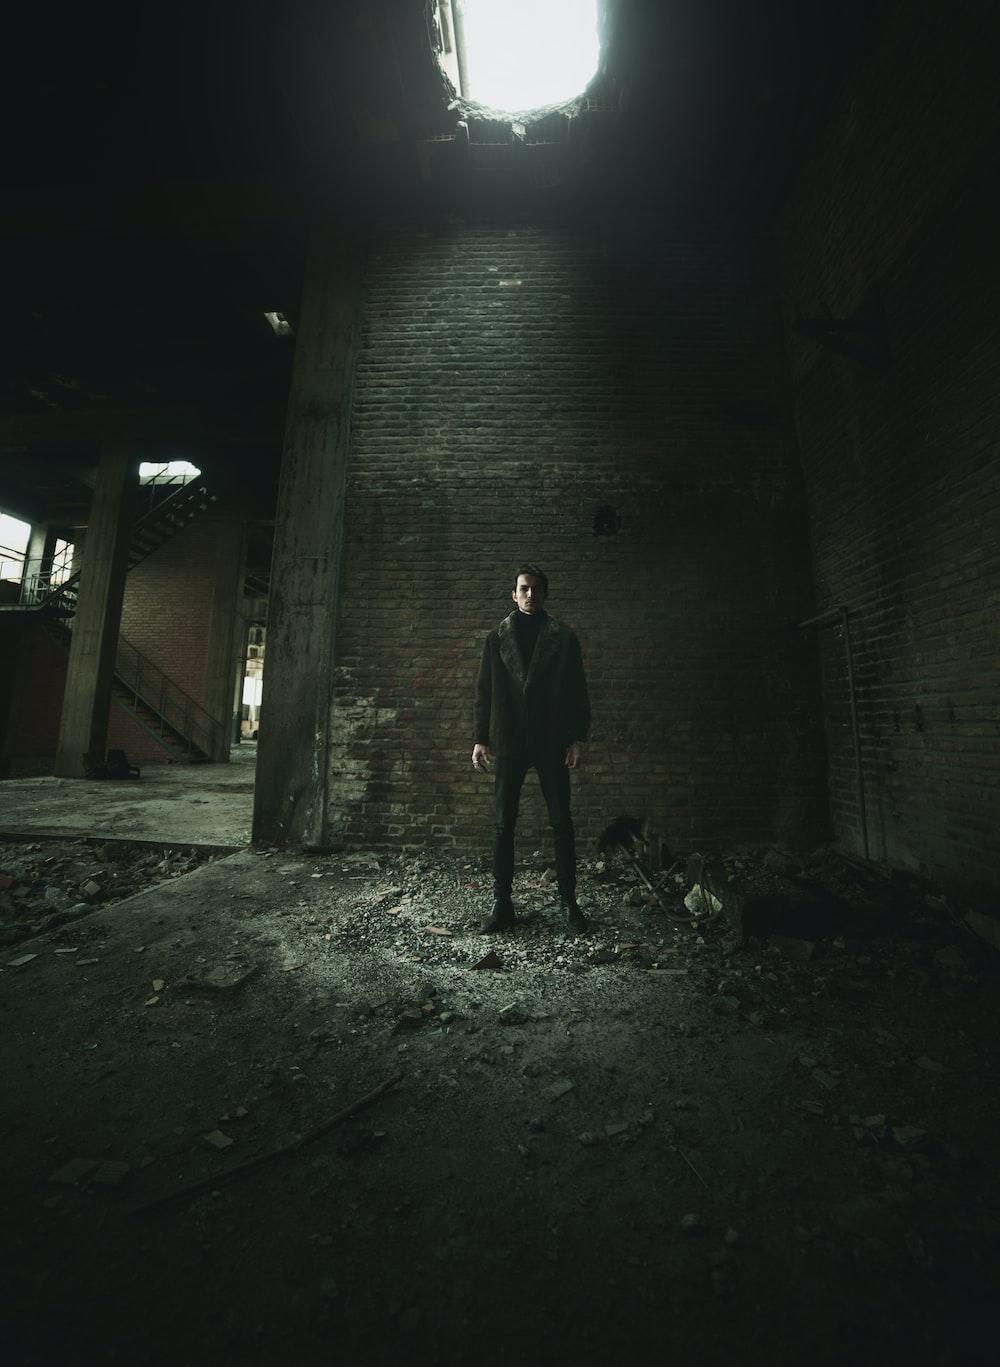 man standing near brick wall